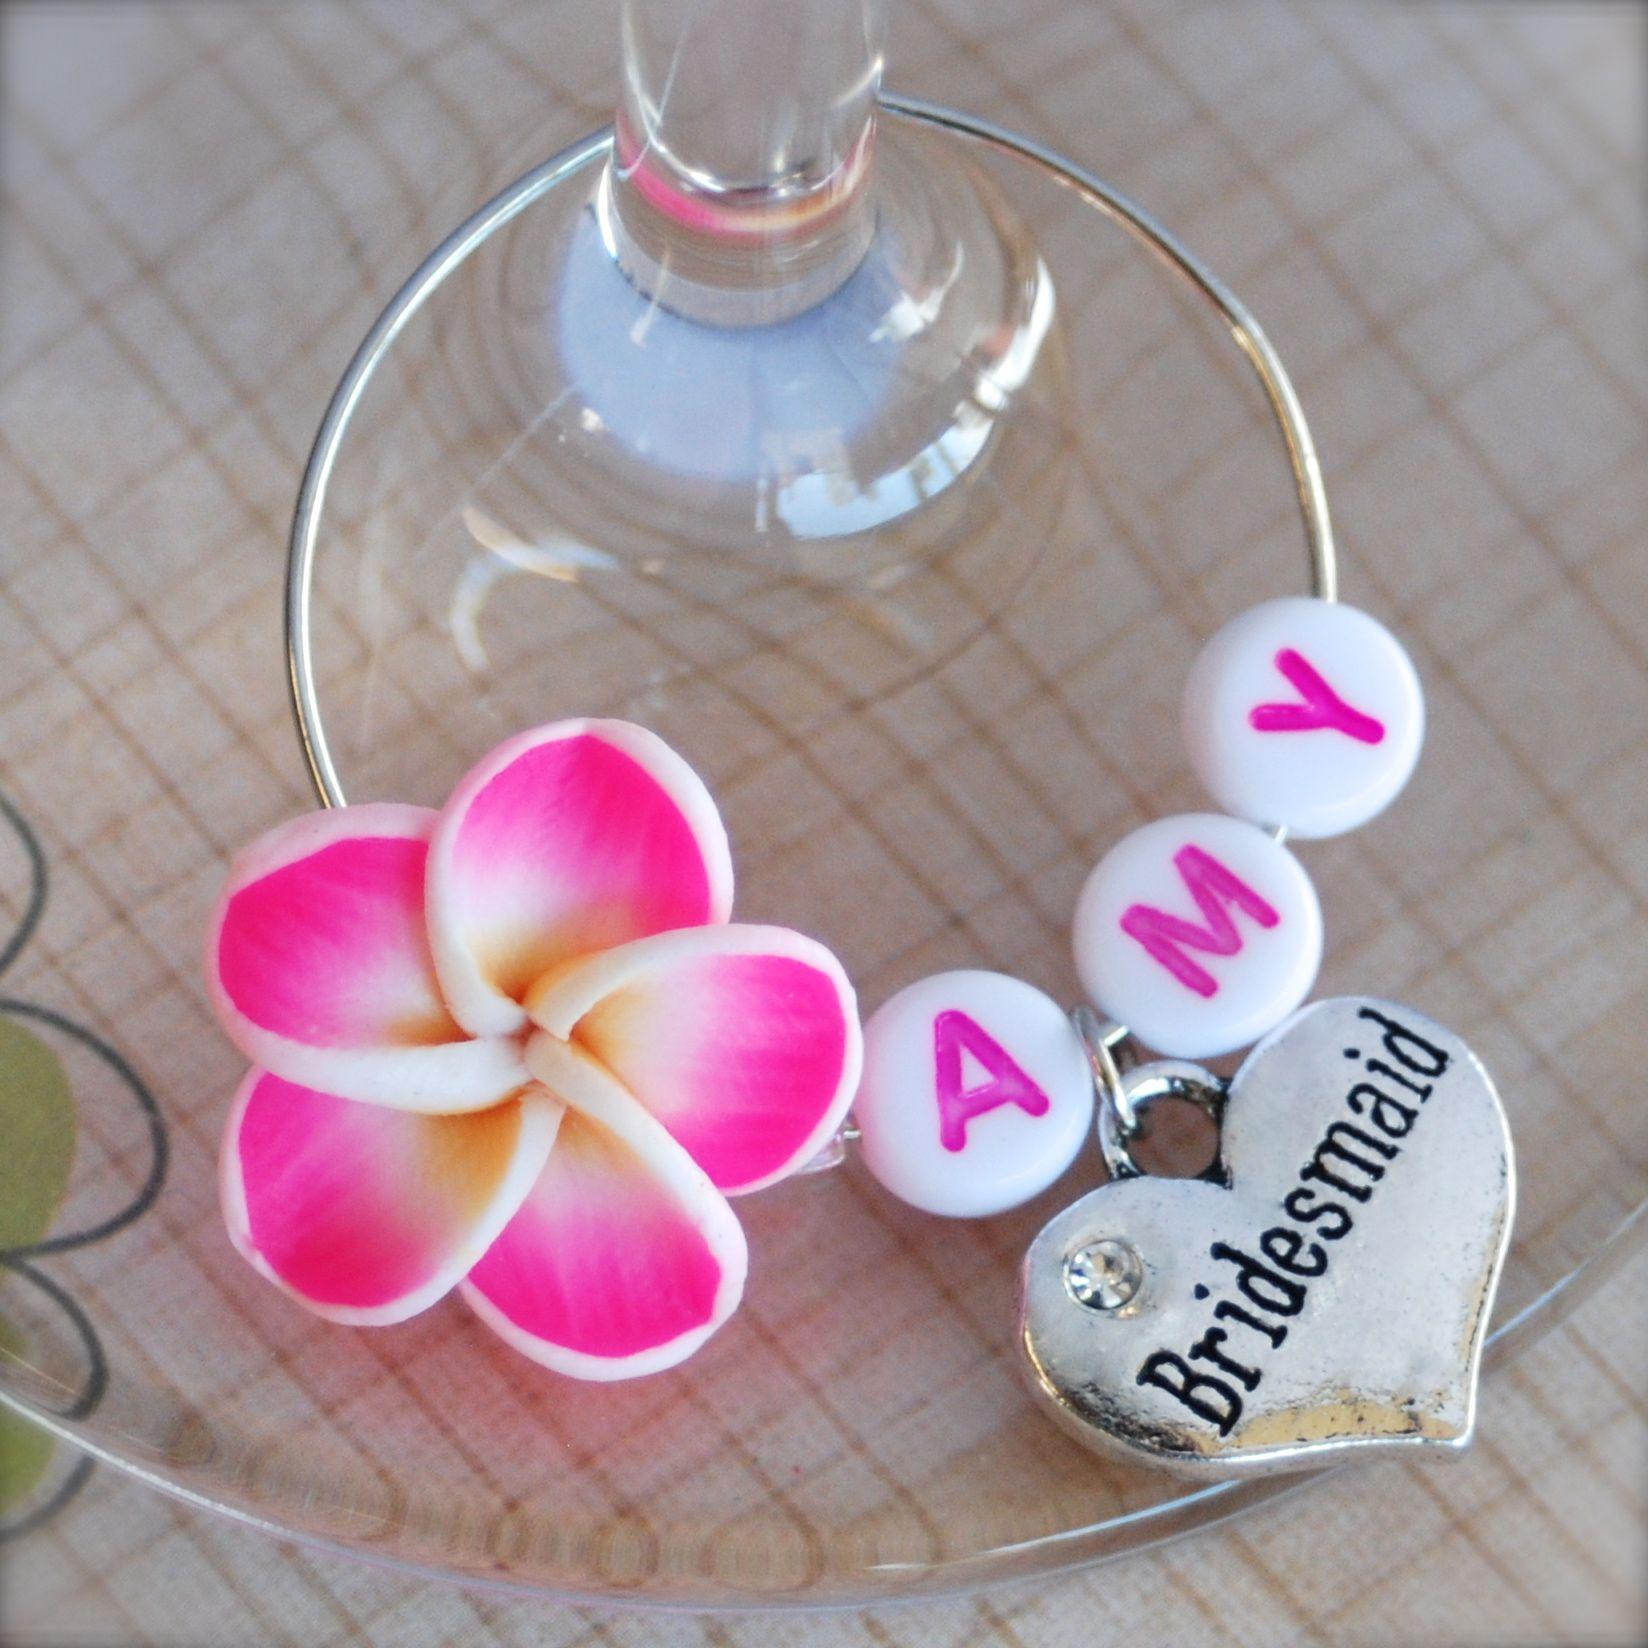 Frangipani Wedding Heart | Champagne glasses, Color themes and Wedding